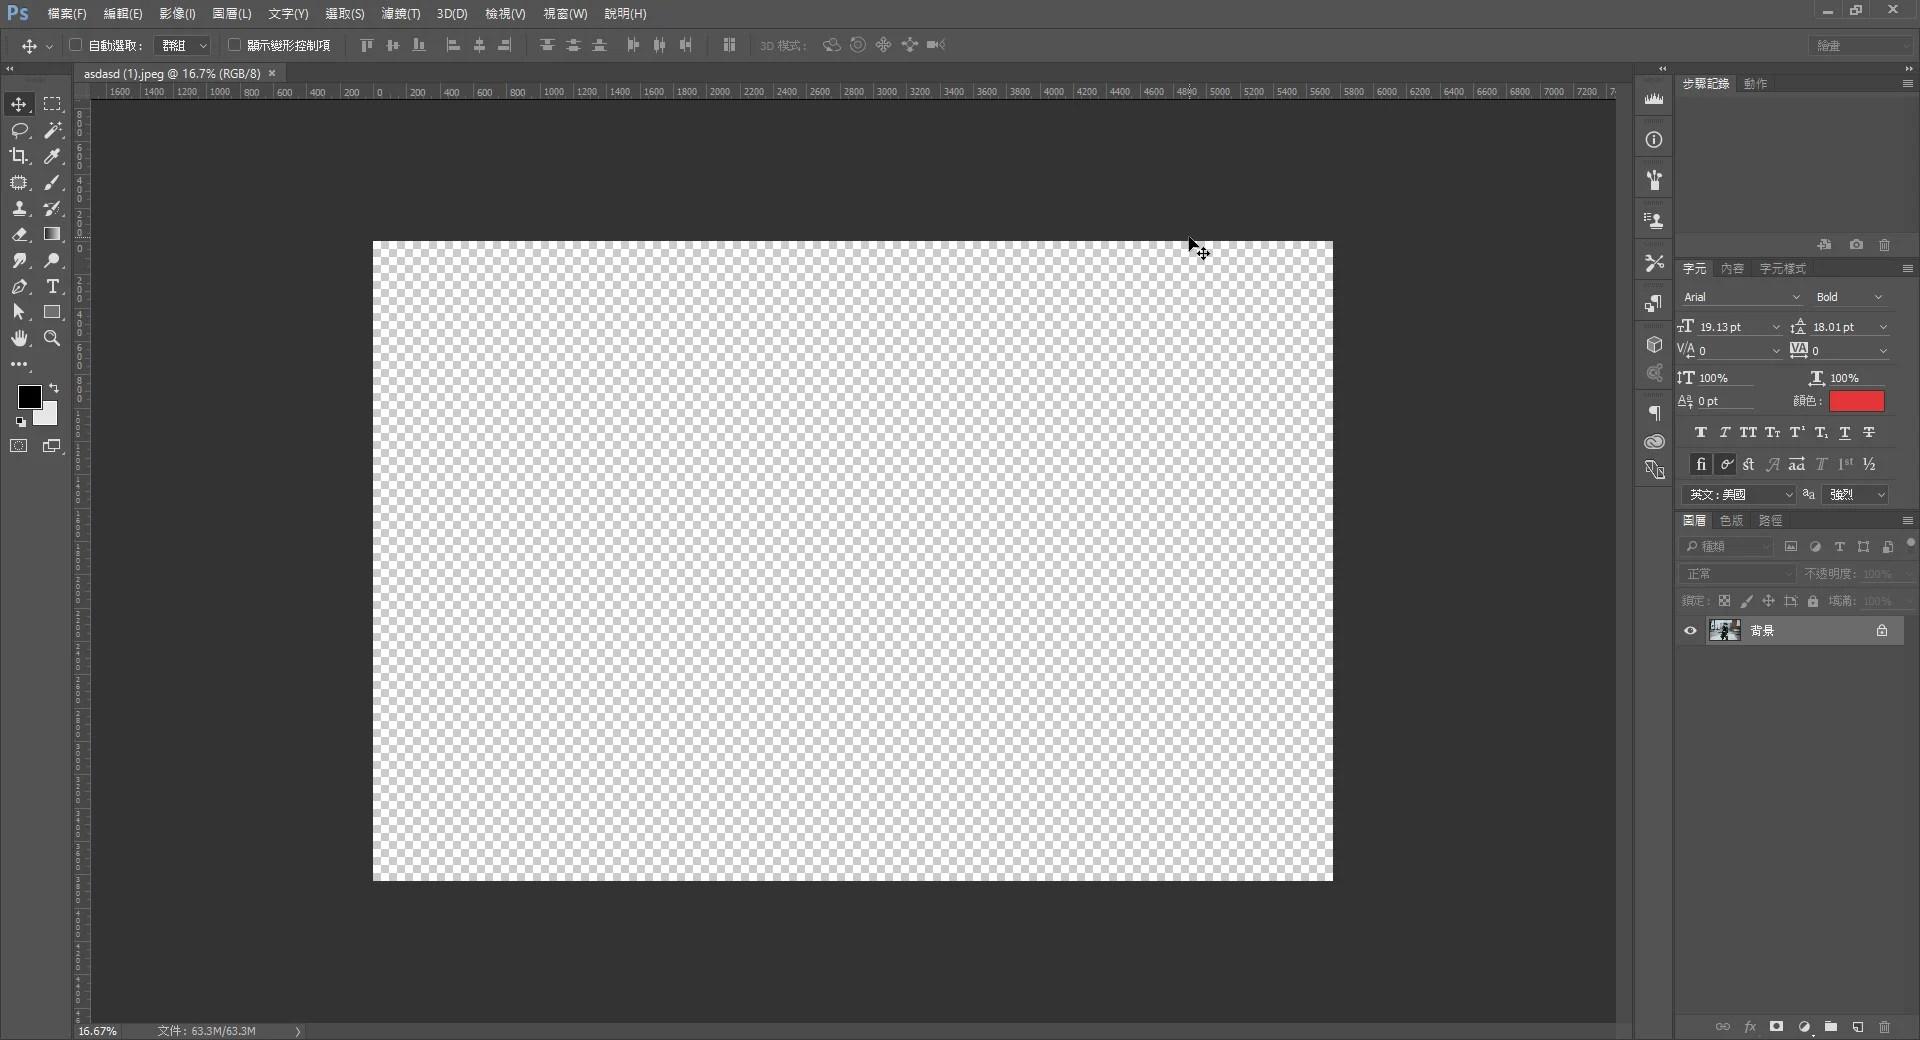 Photoshop教學:【基礎應用】修改大量圖檔尺寸與壓縮 - Astral Web 歐斯瑞有限公司